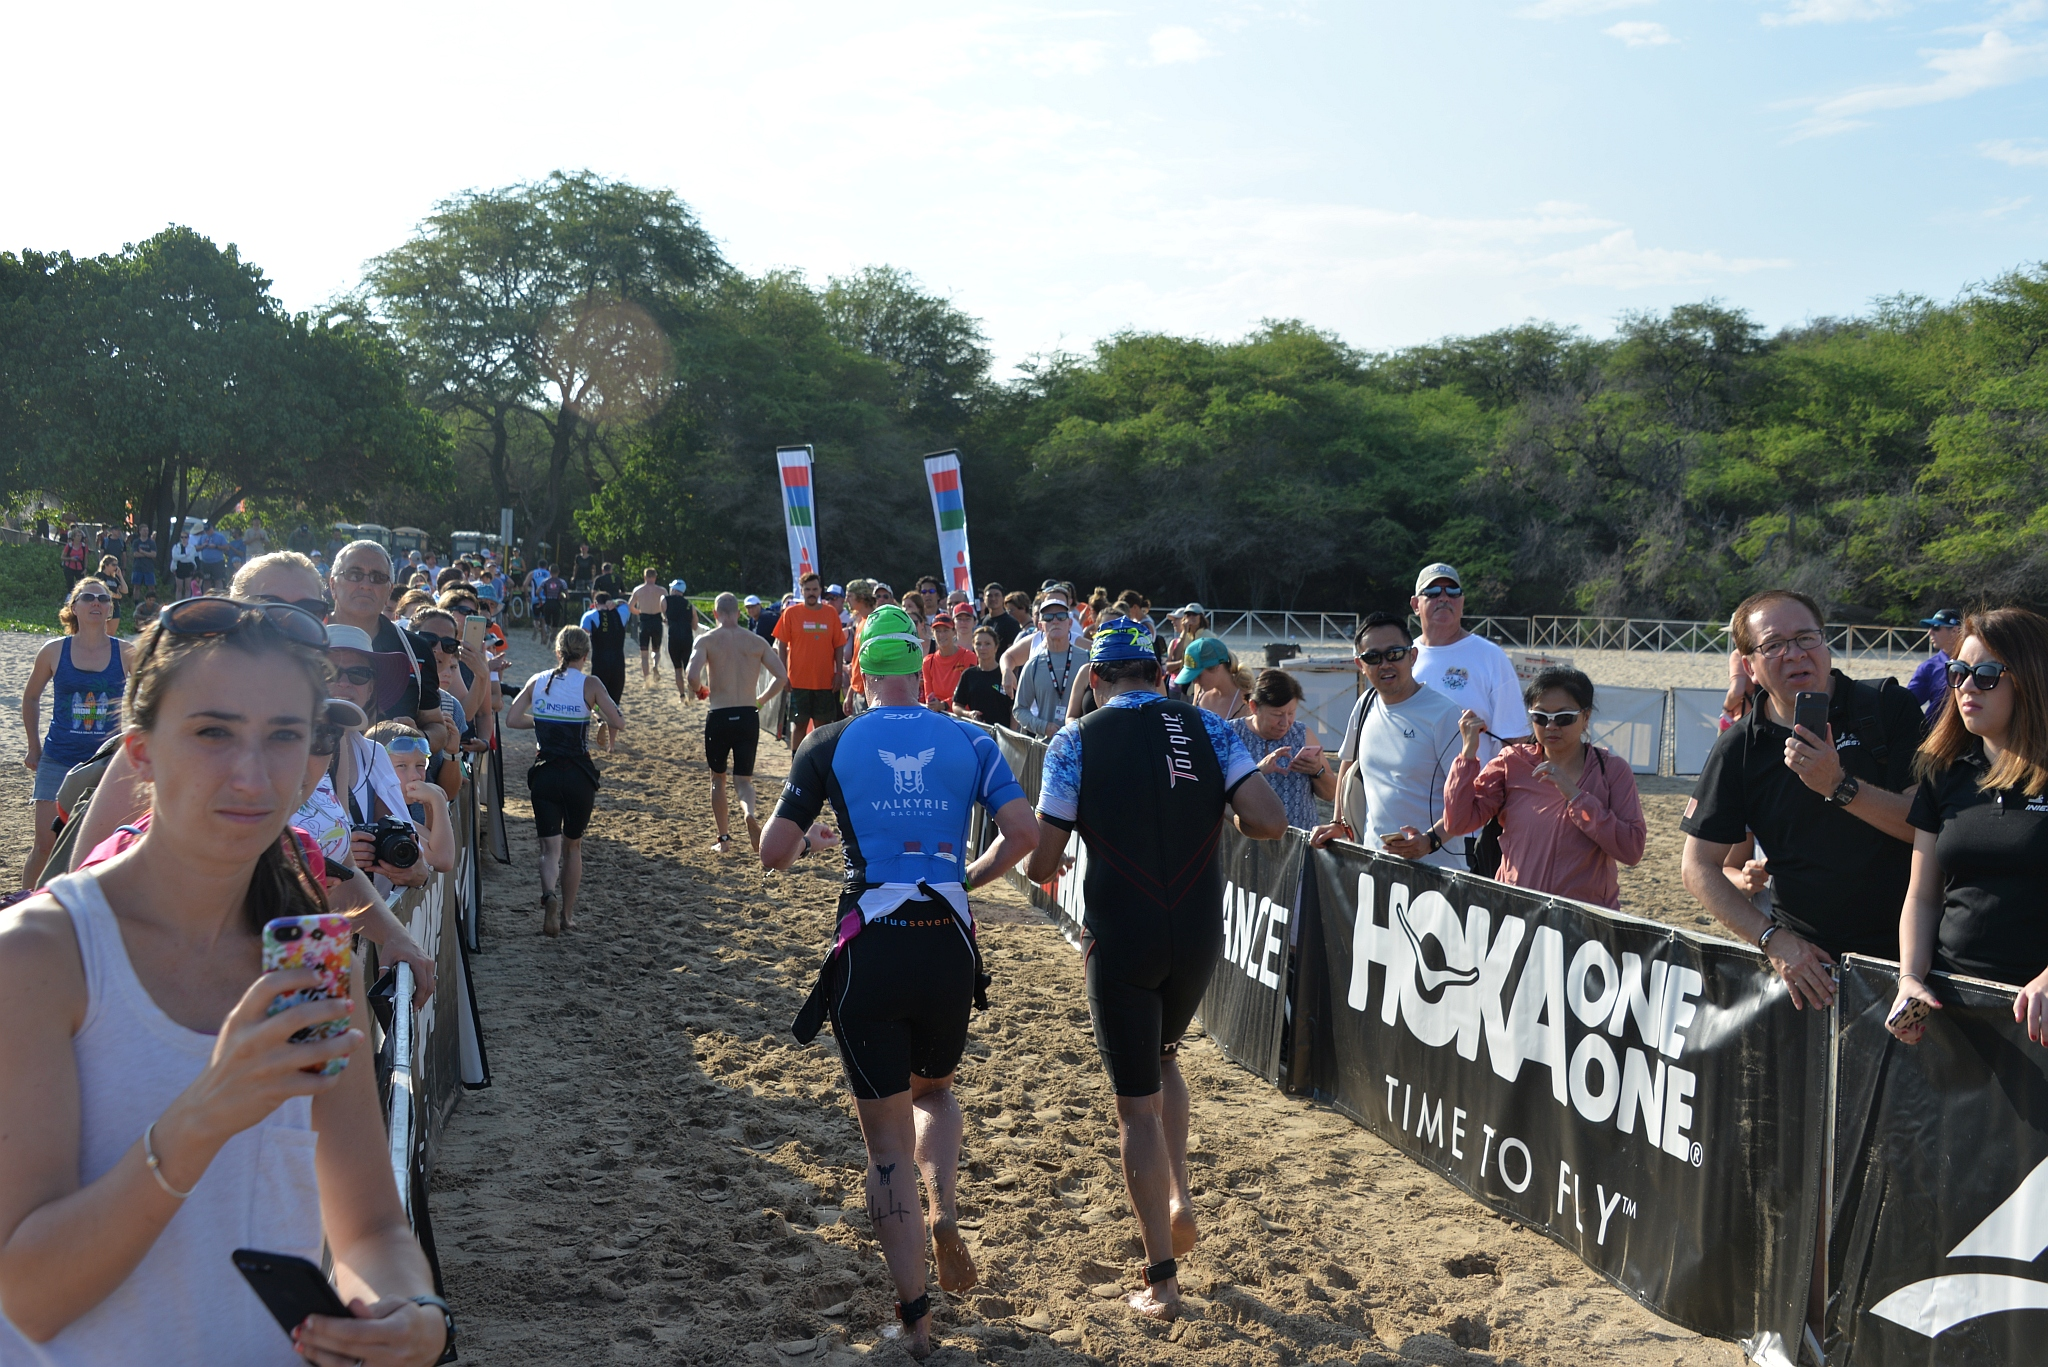 Coach_Terry_Wilson_Gemma_Hollis_Ironman_Hawaii_70.3_Push_Glide_Kick_E3TS_E3_Training_Solutions_2.JPG